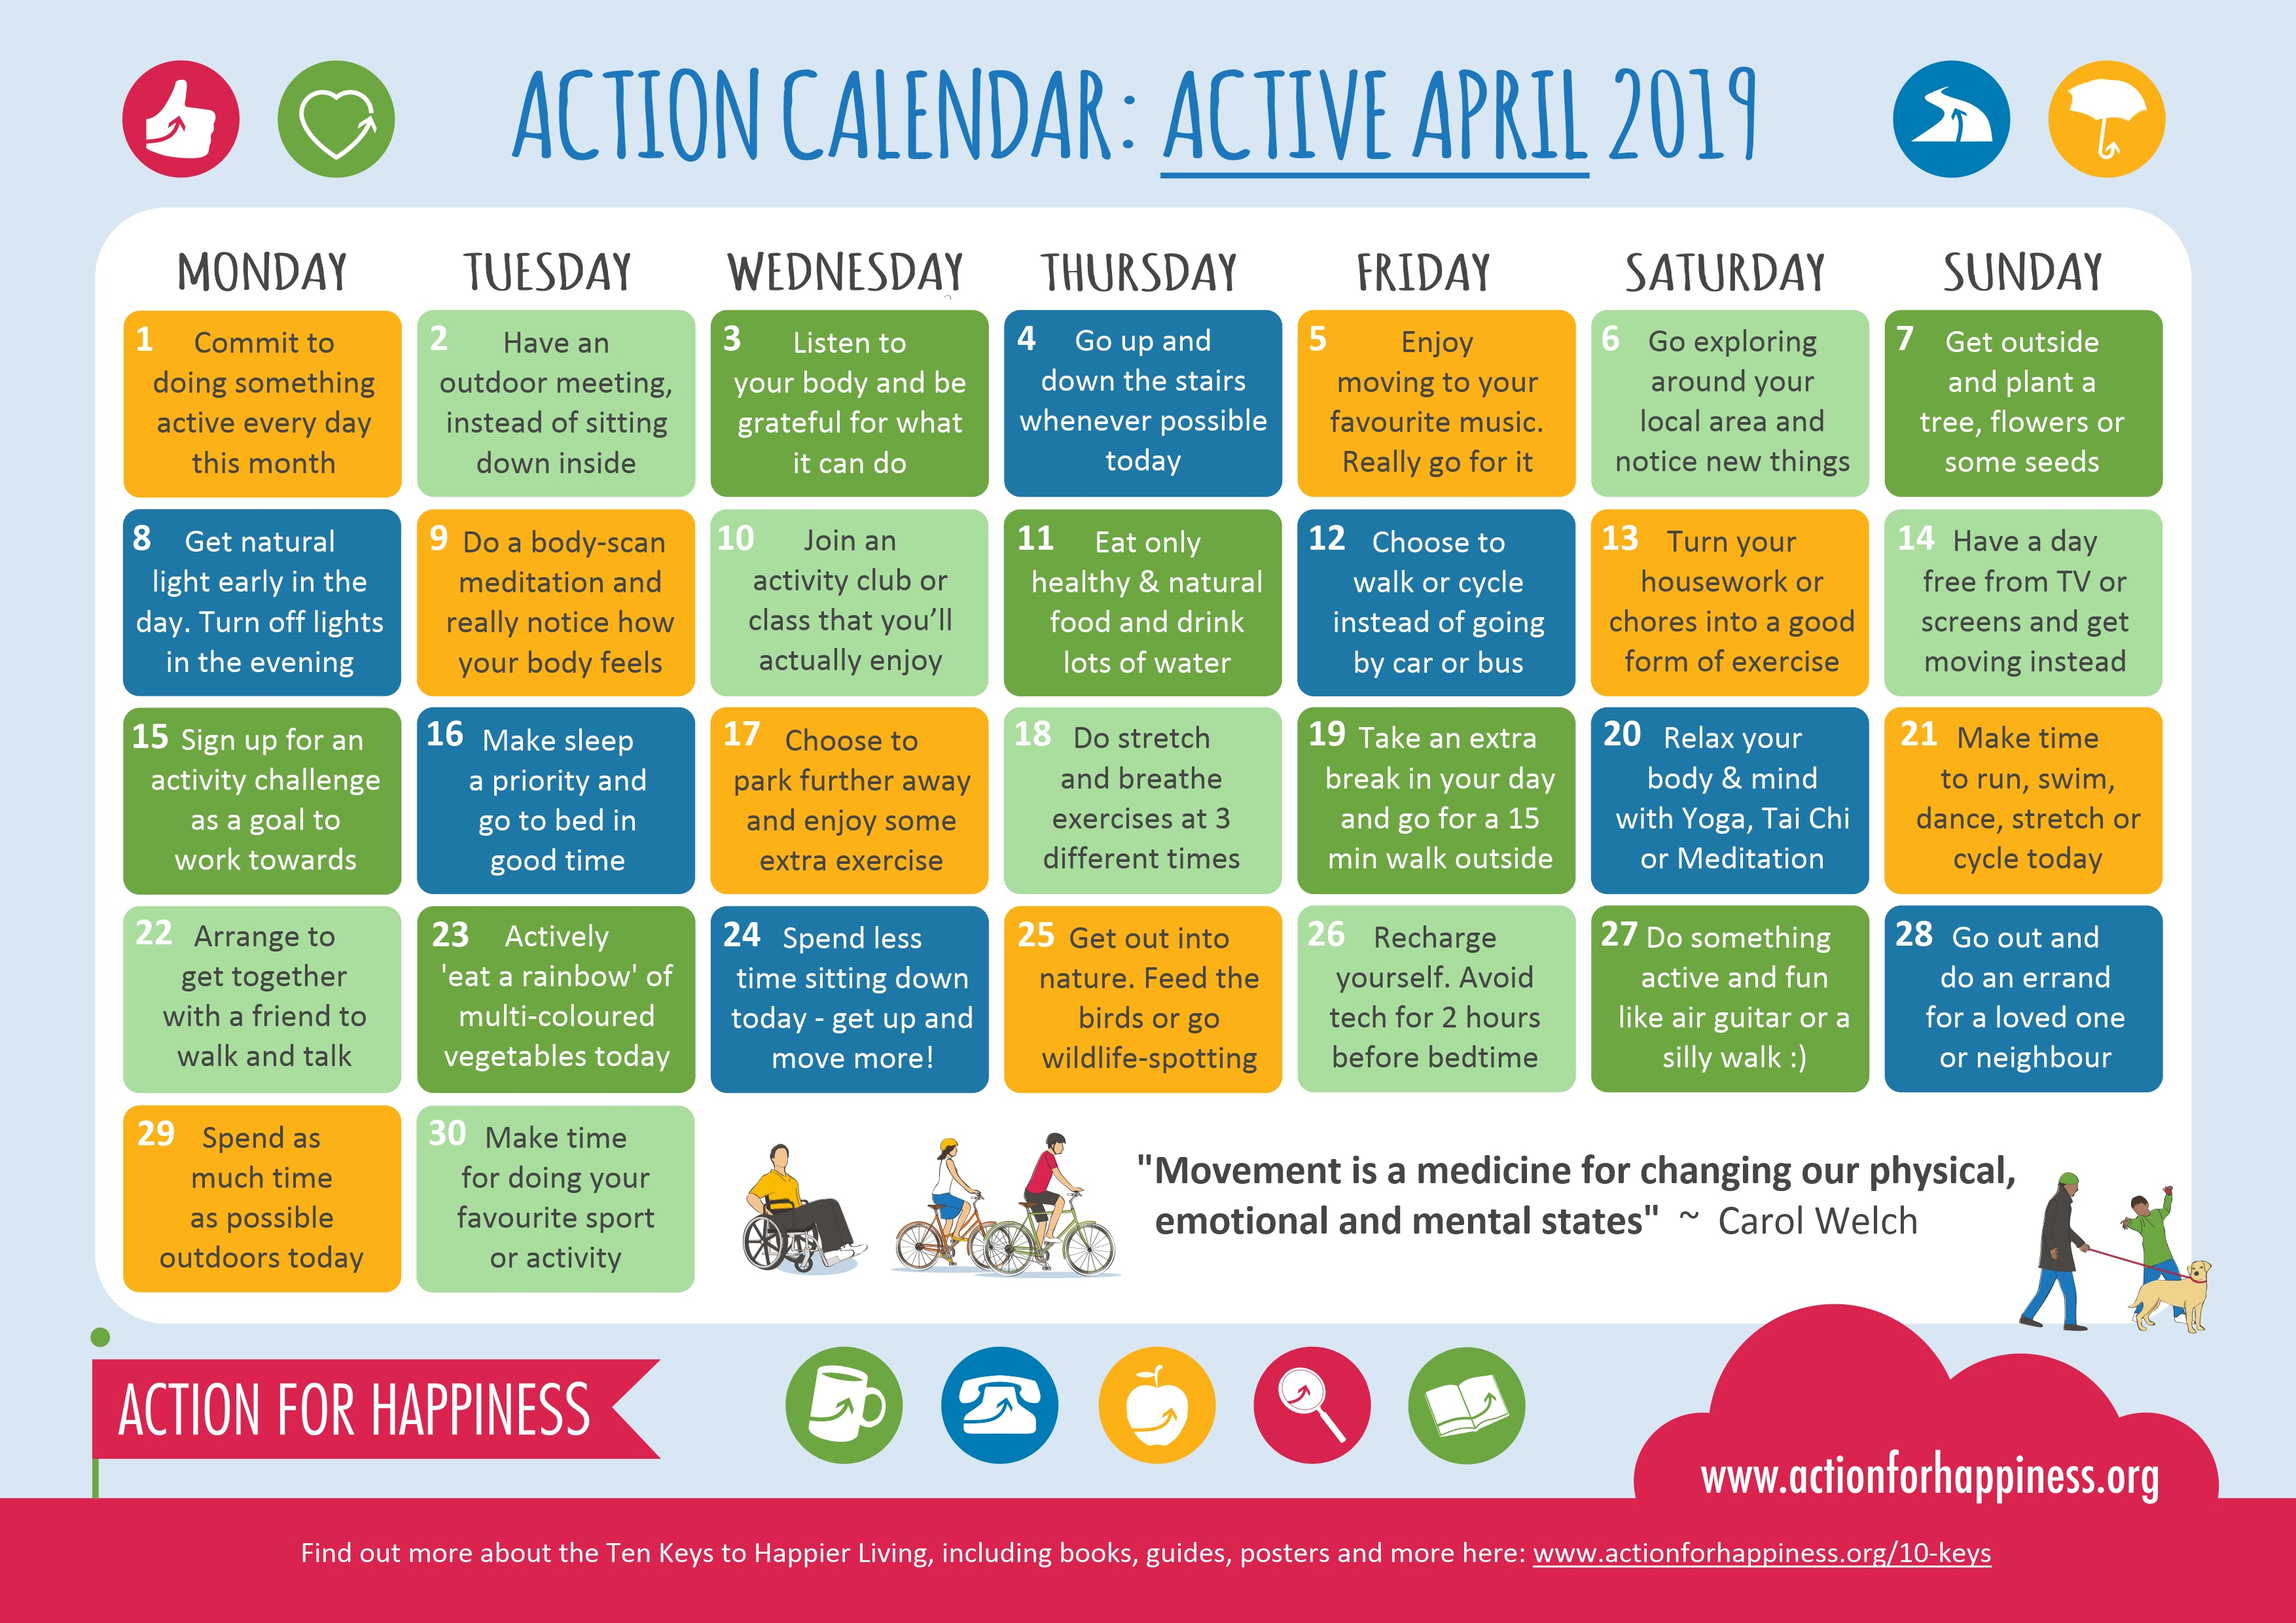 Active April Calendar with regard to Time And Action Calendar